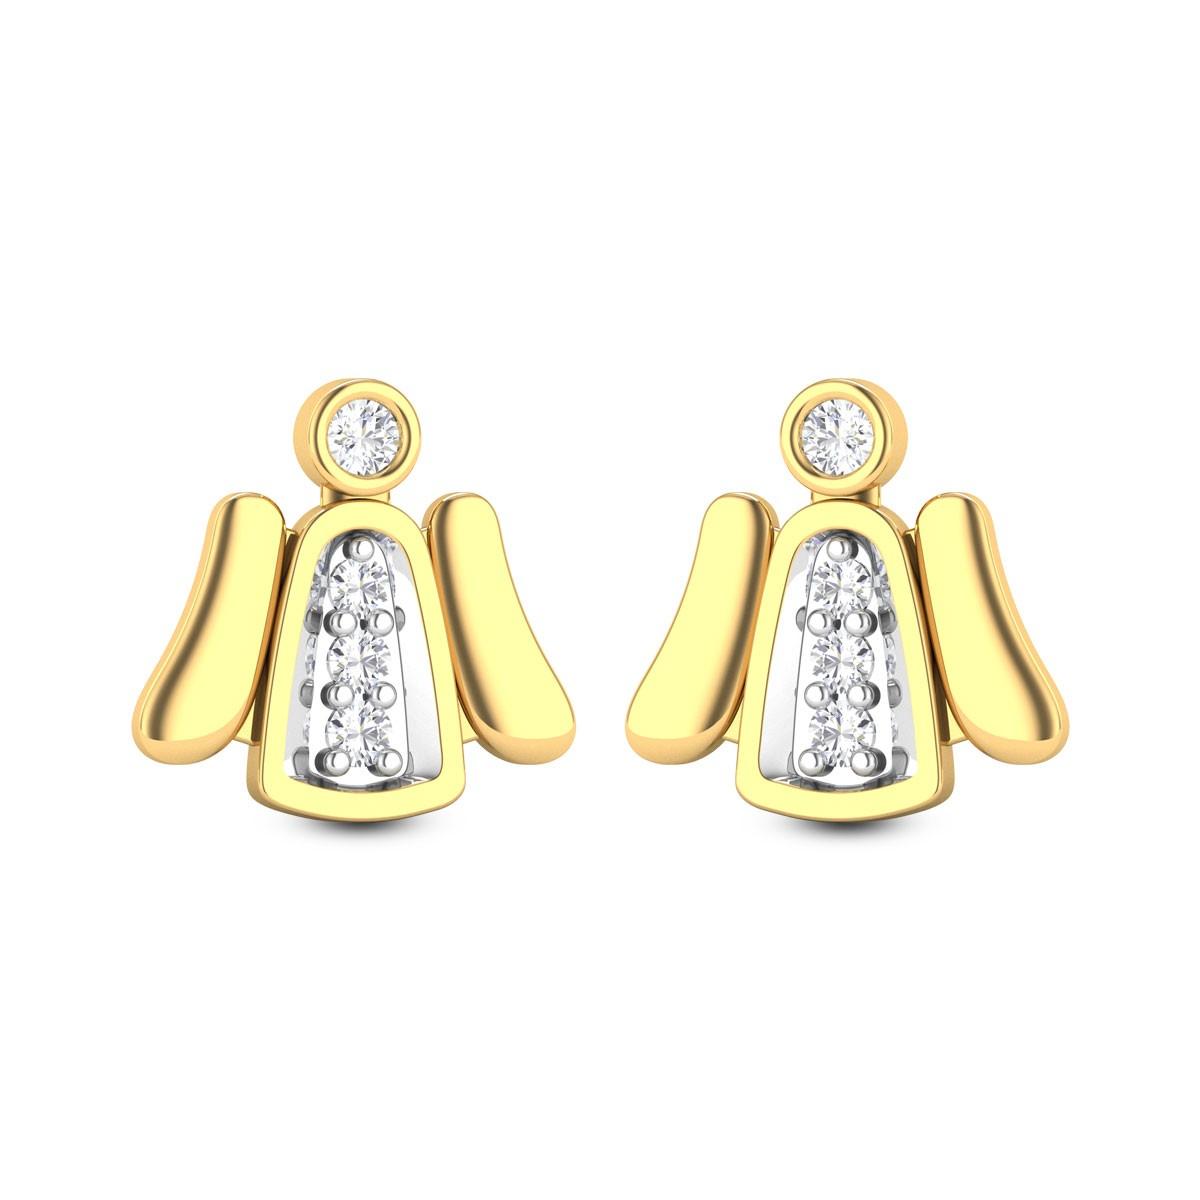 China Doll Diamond Earrings